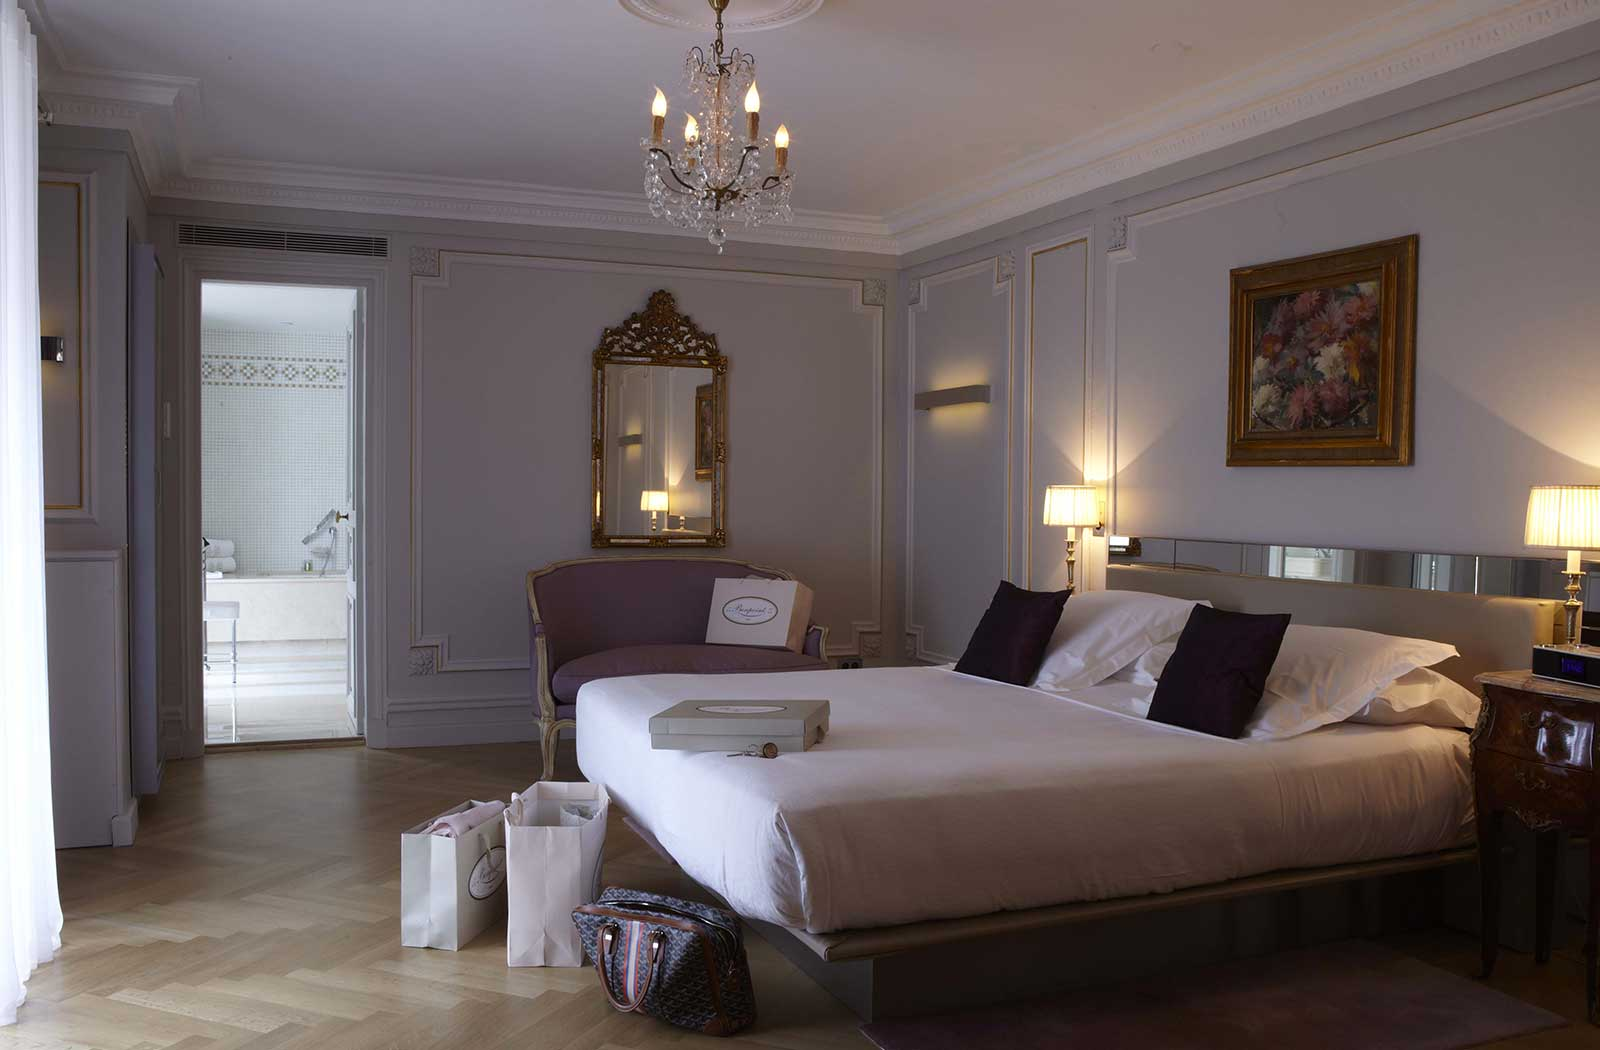 /images/hotel_lancaster_paris_5.jpg